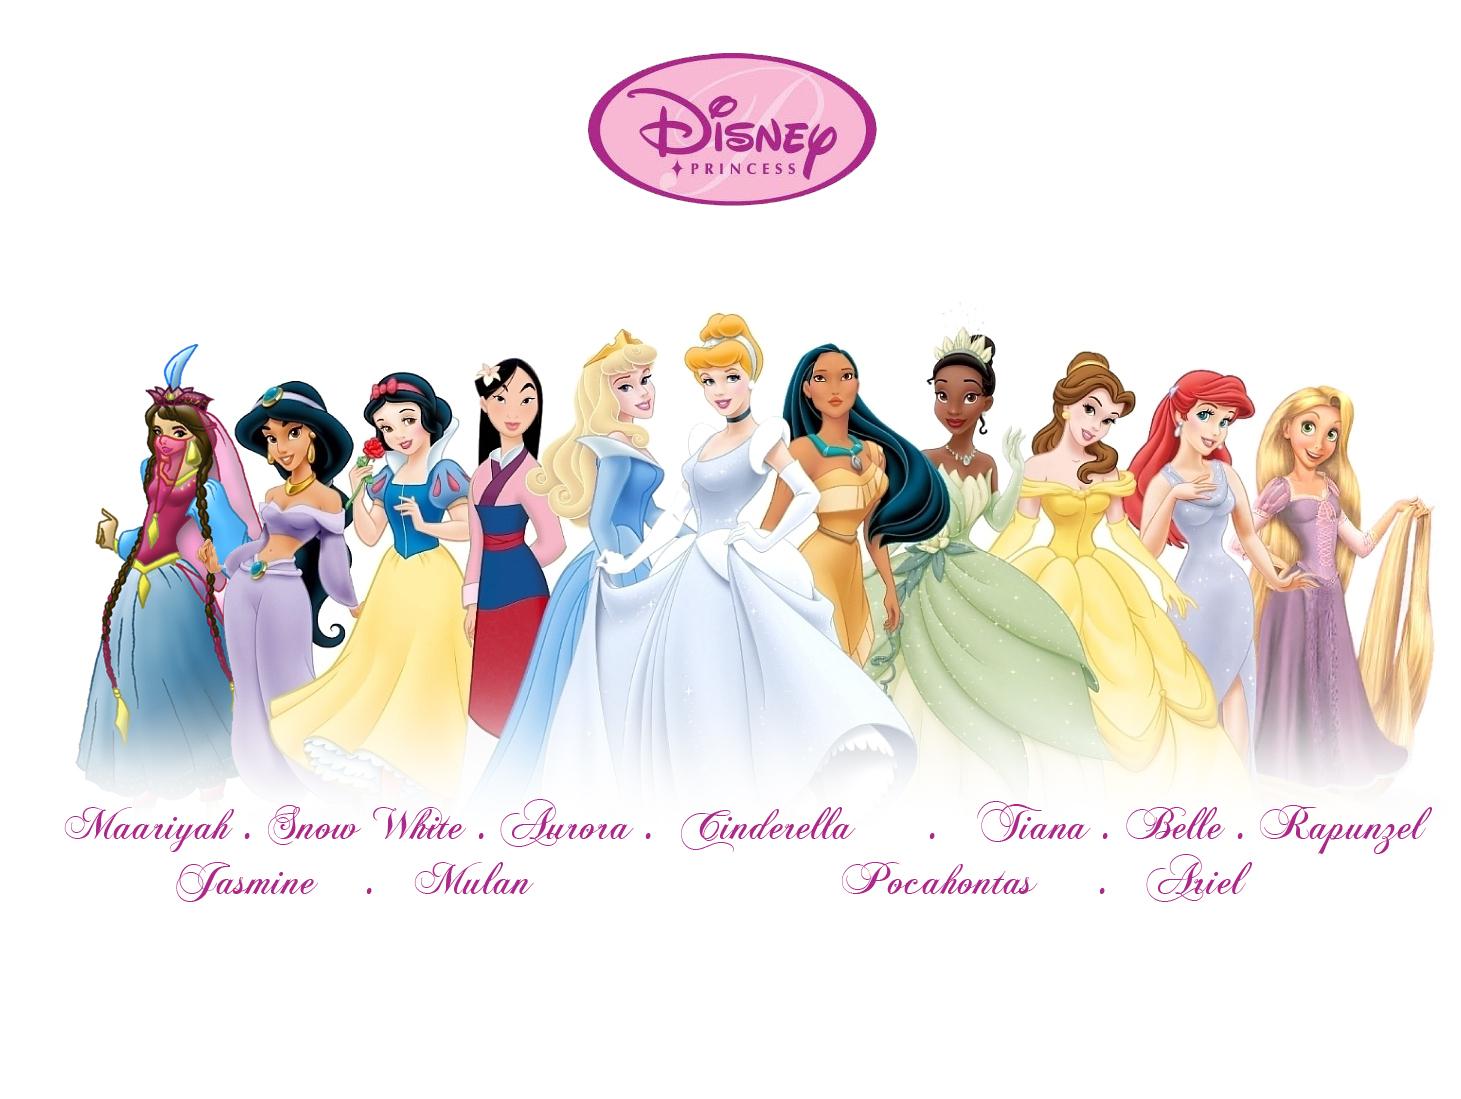 Disney Princesses Names Pictures Disney Princess Names